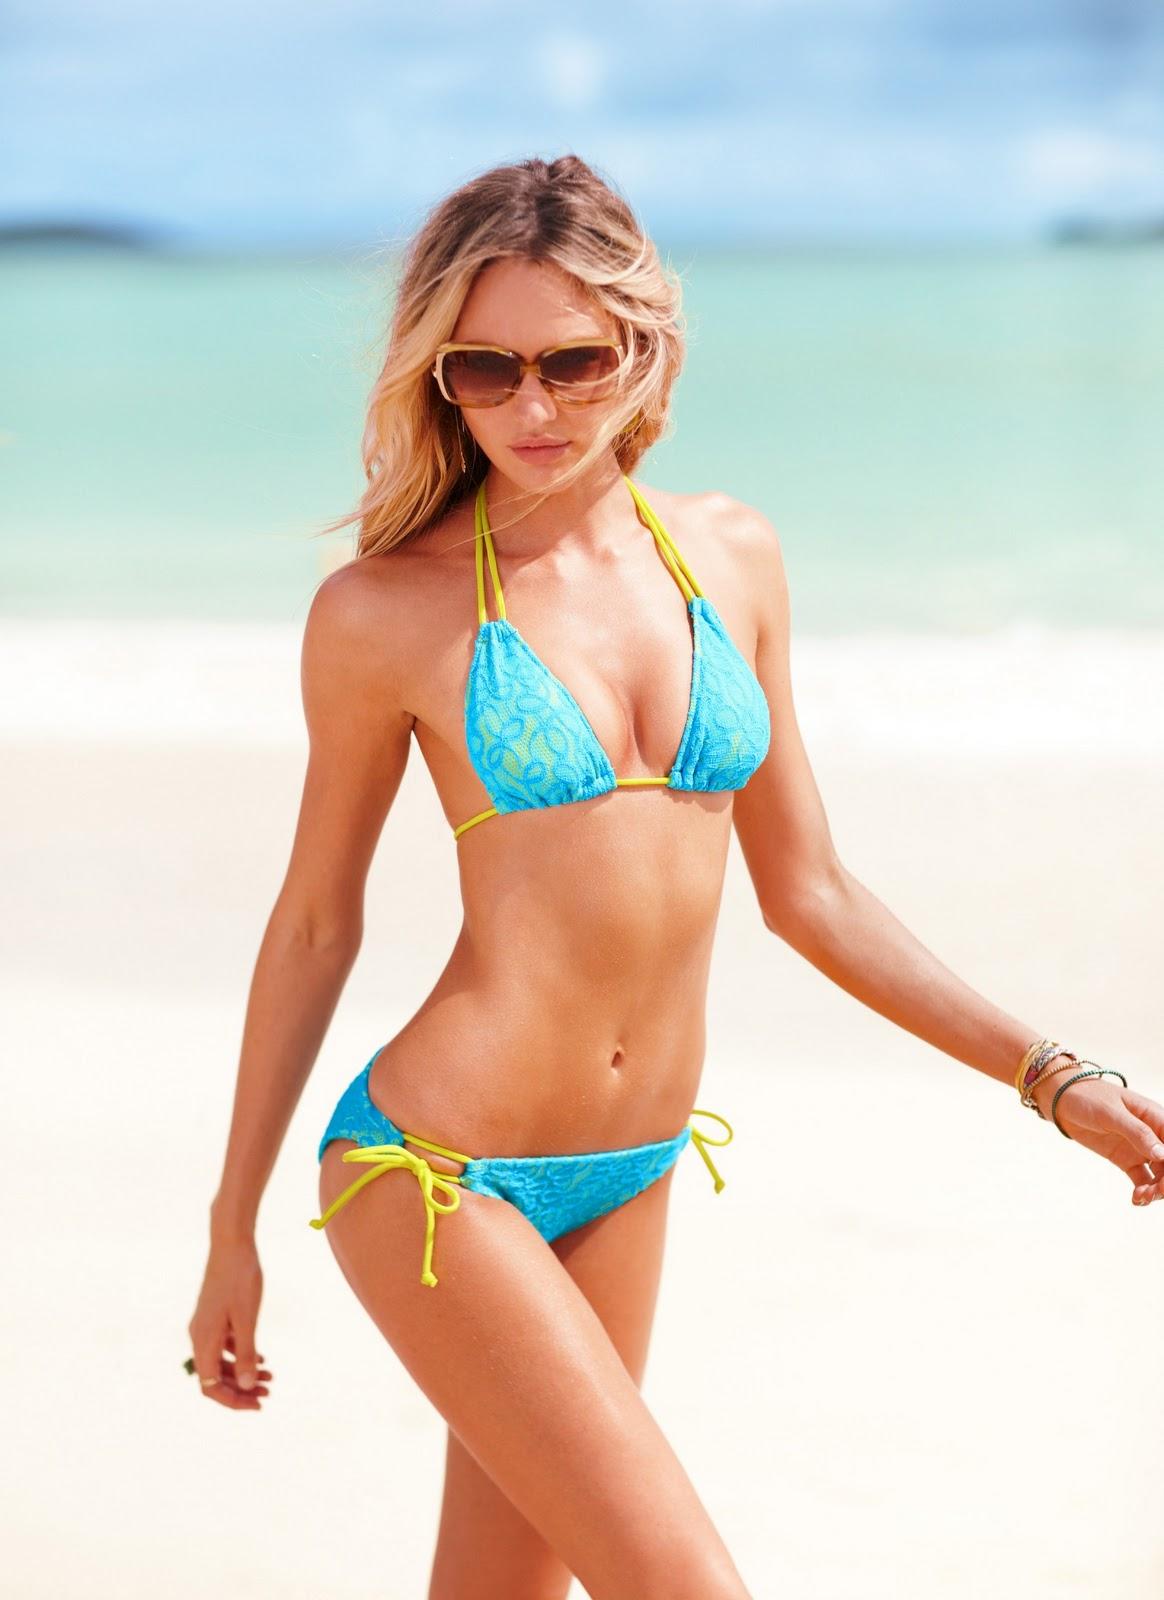 http://4.bp.blogspot.com/_N6m6xa31CEM/TUPa4V9dgEI/AAAAAAAADFc/GEclf3fJ4s0/s1600/Candice+Swanepoel++Victoria%25E2%2580%2599s+Secret+Swim+Photos.jpg